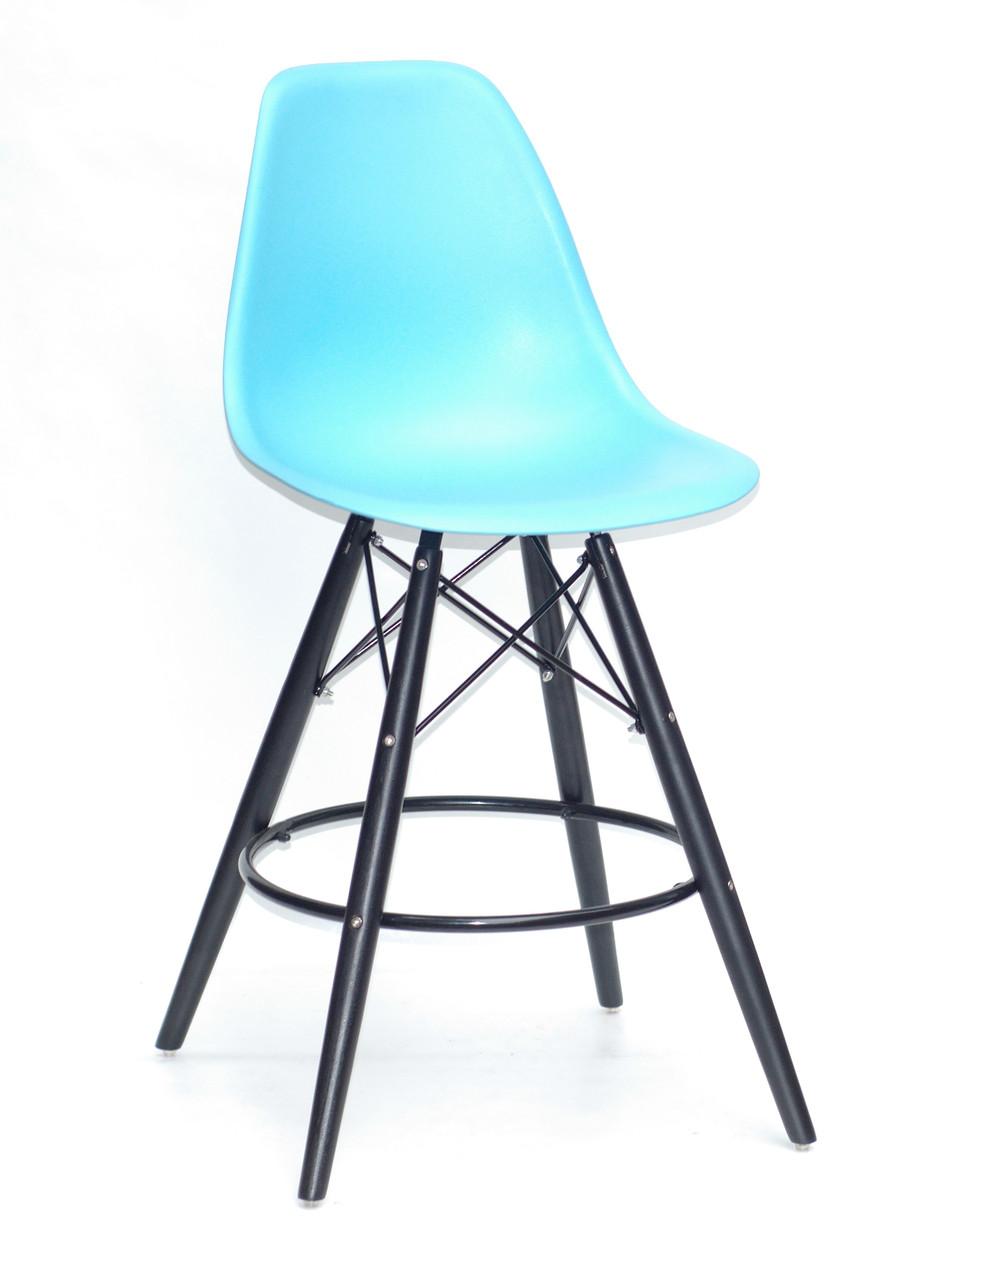 Полубарный стілець Nik BK Eames, блакитний 52